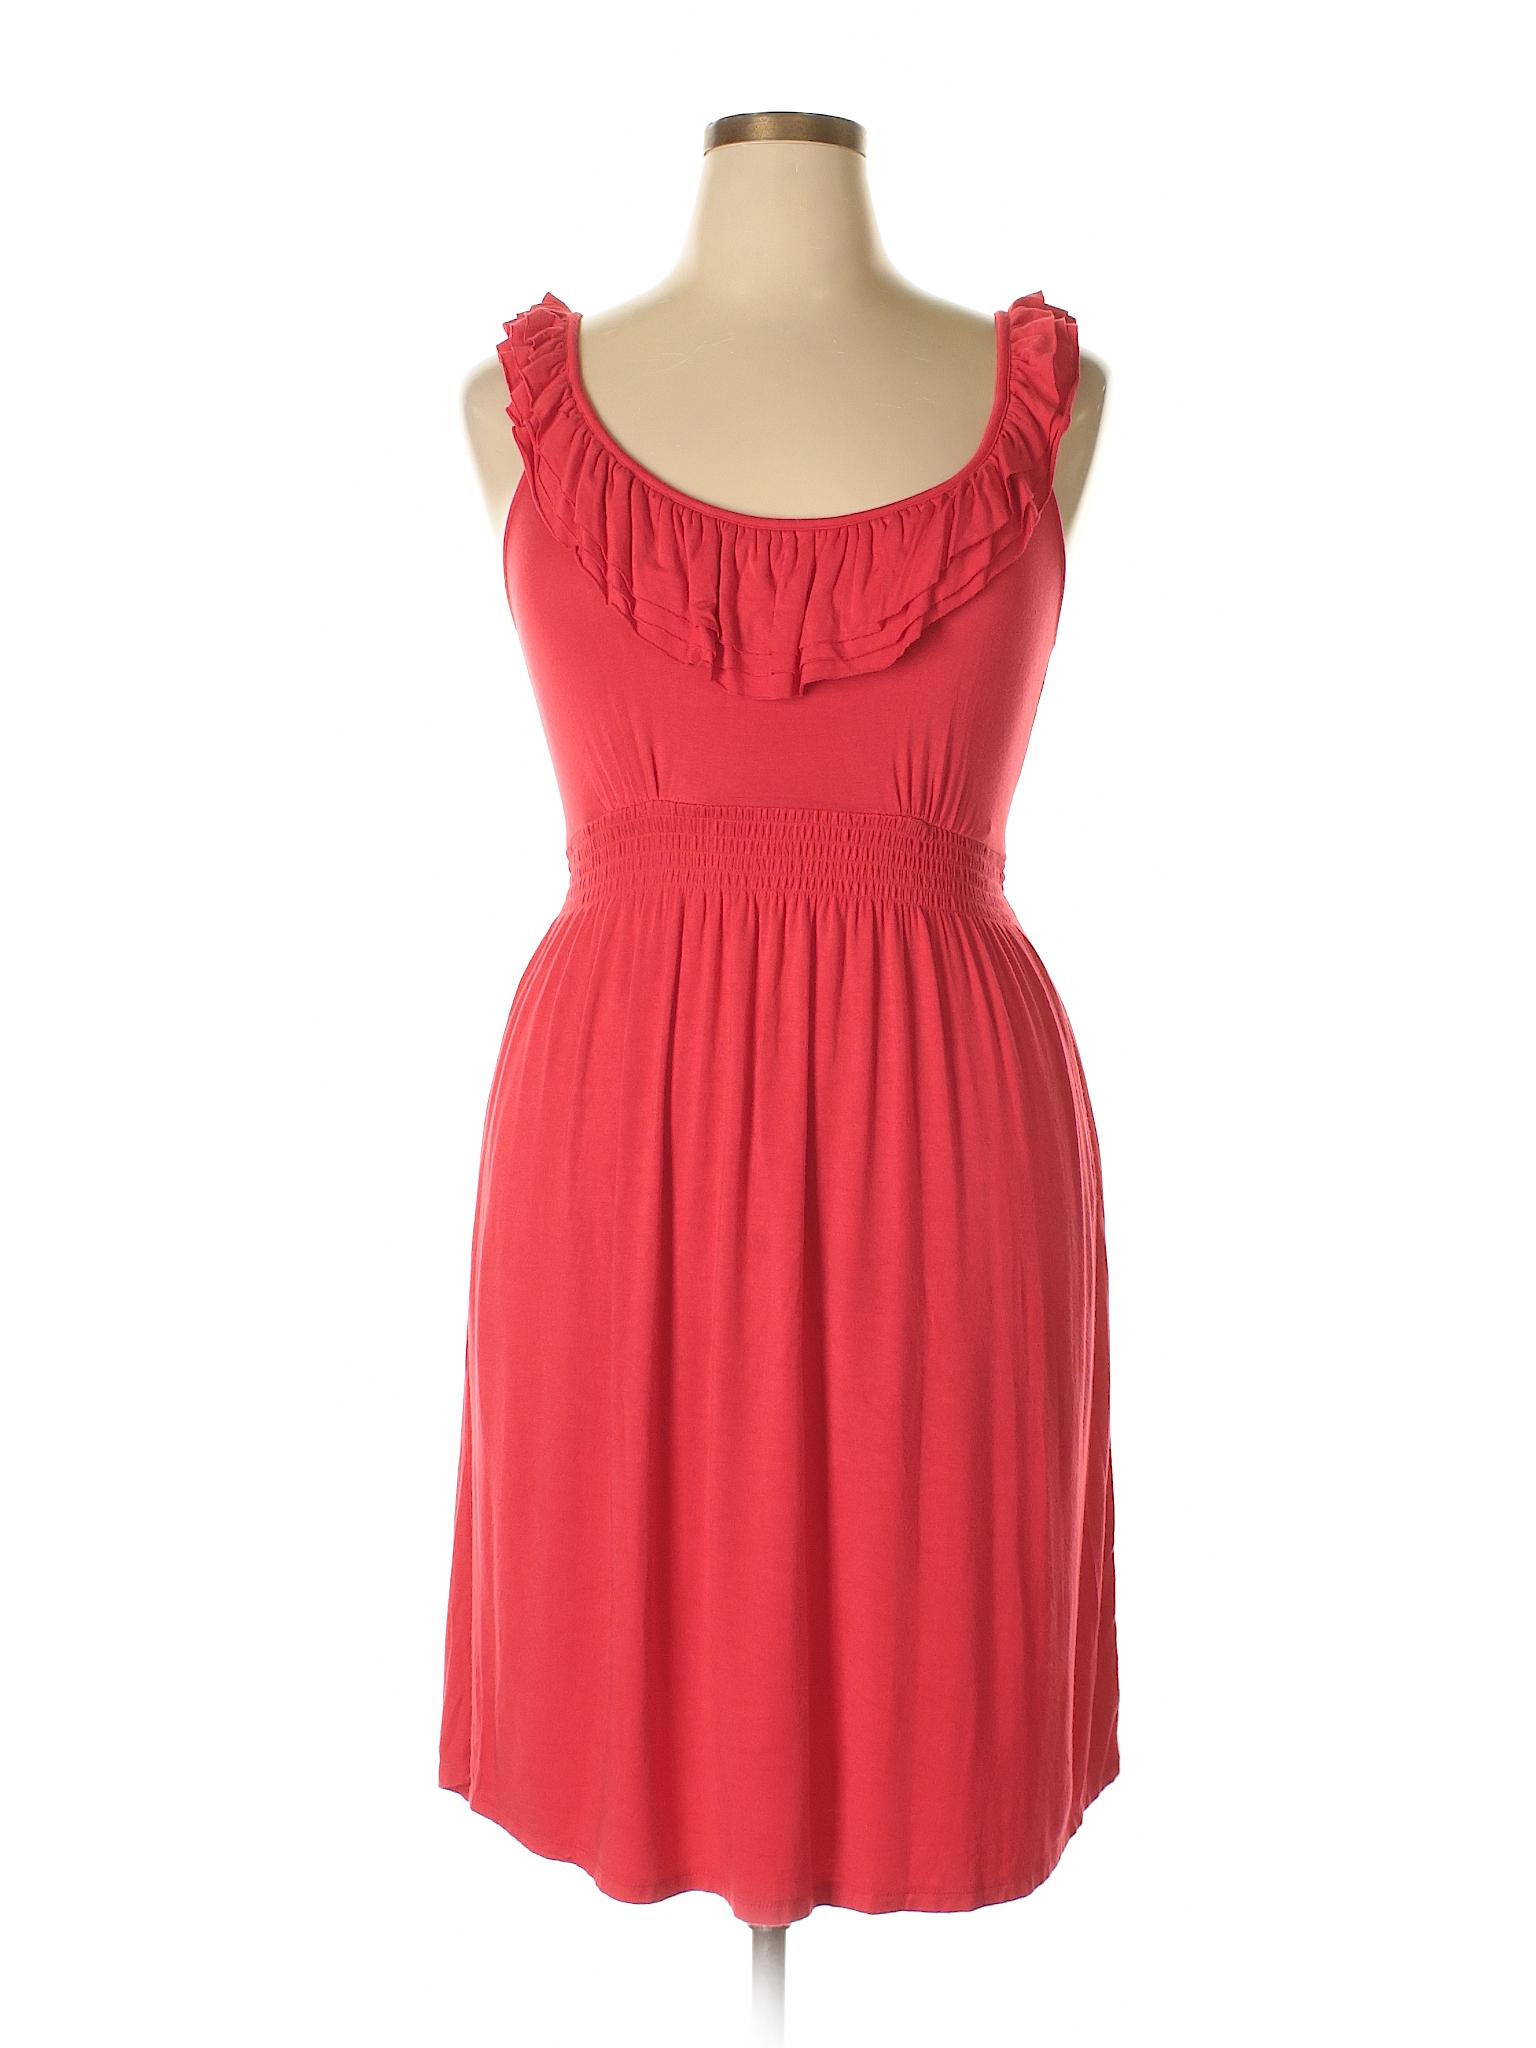 75b69753cff5 Charming Charlie Solid Orange Casual Dress Size L - 58% off | thredUP